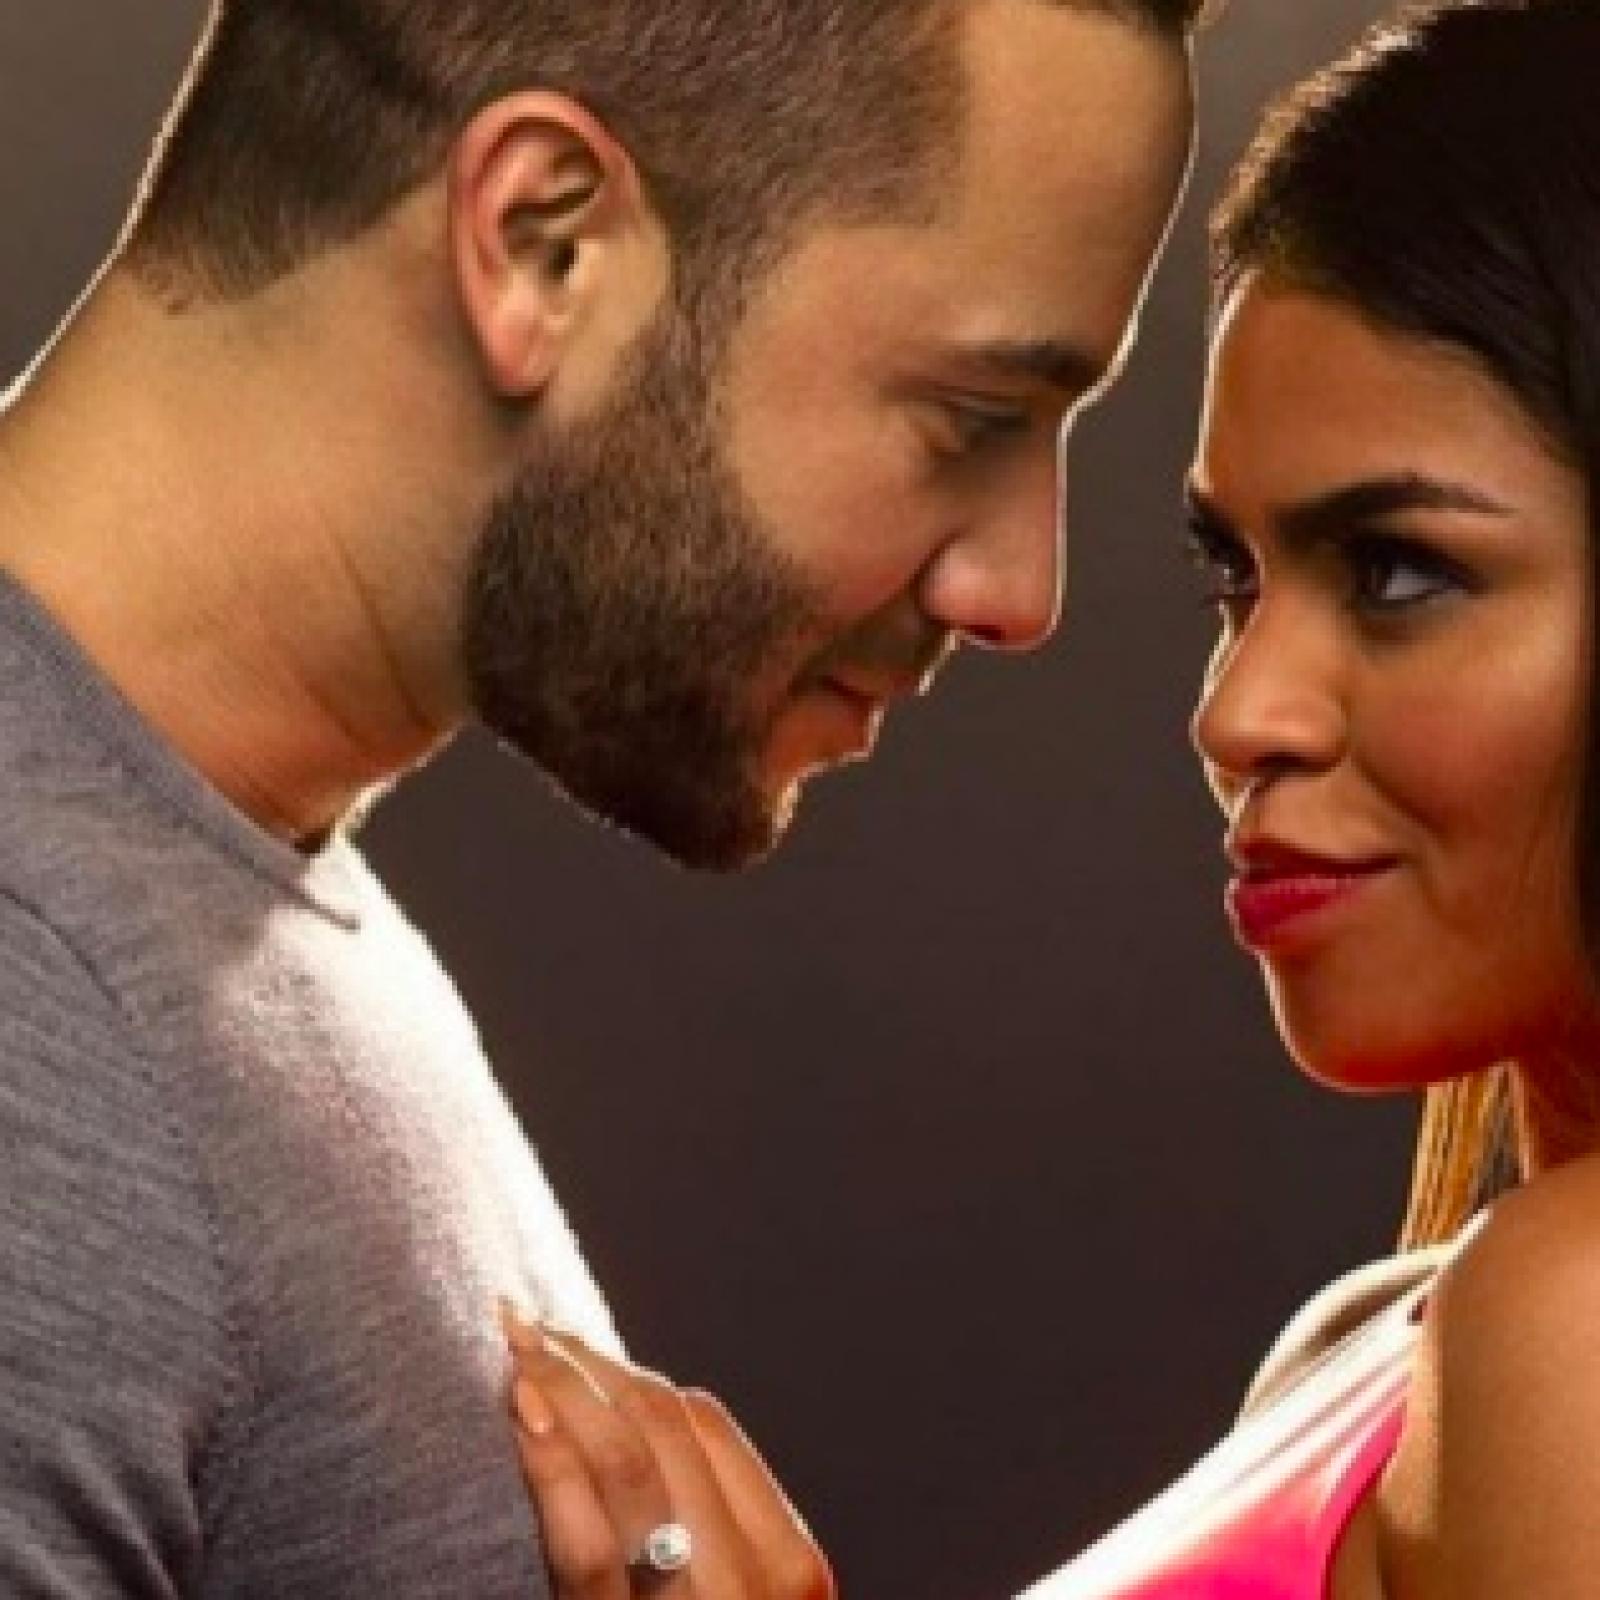 Why Did Fernanda and Jonathan Break Up? '90 Day Fiancé' Stars Hint